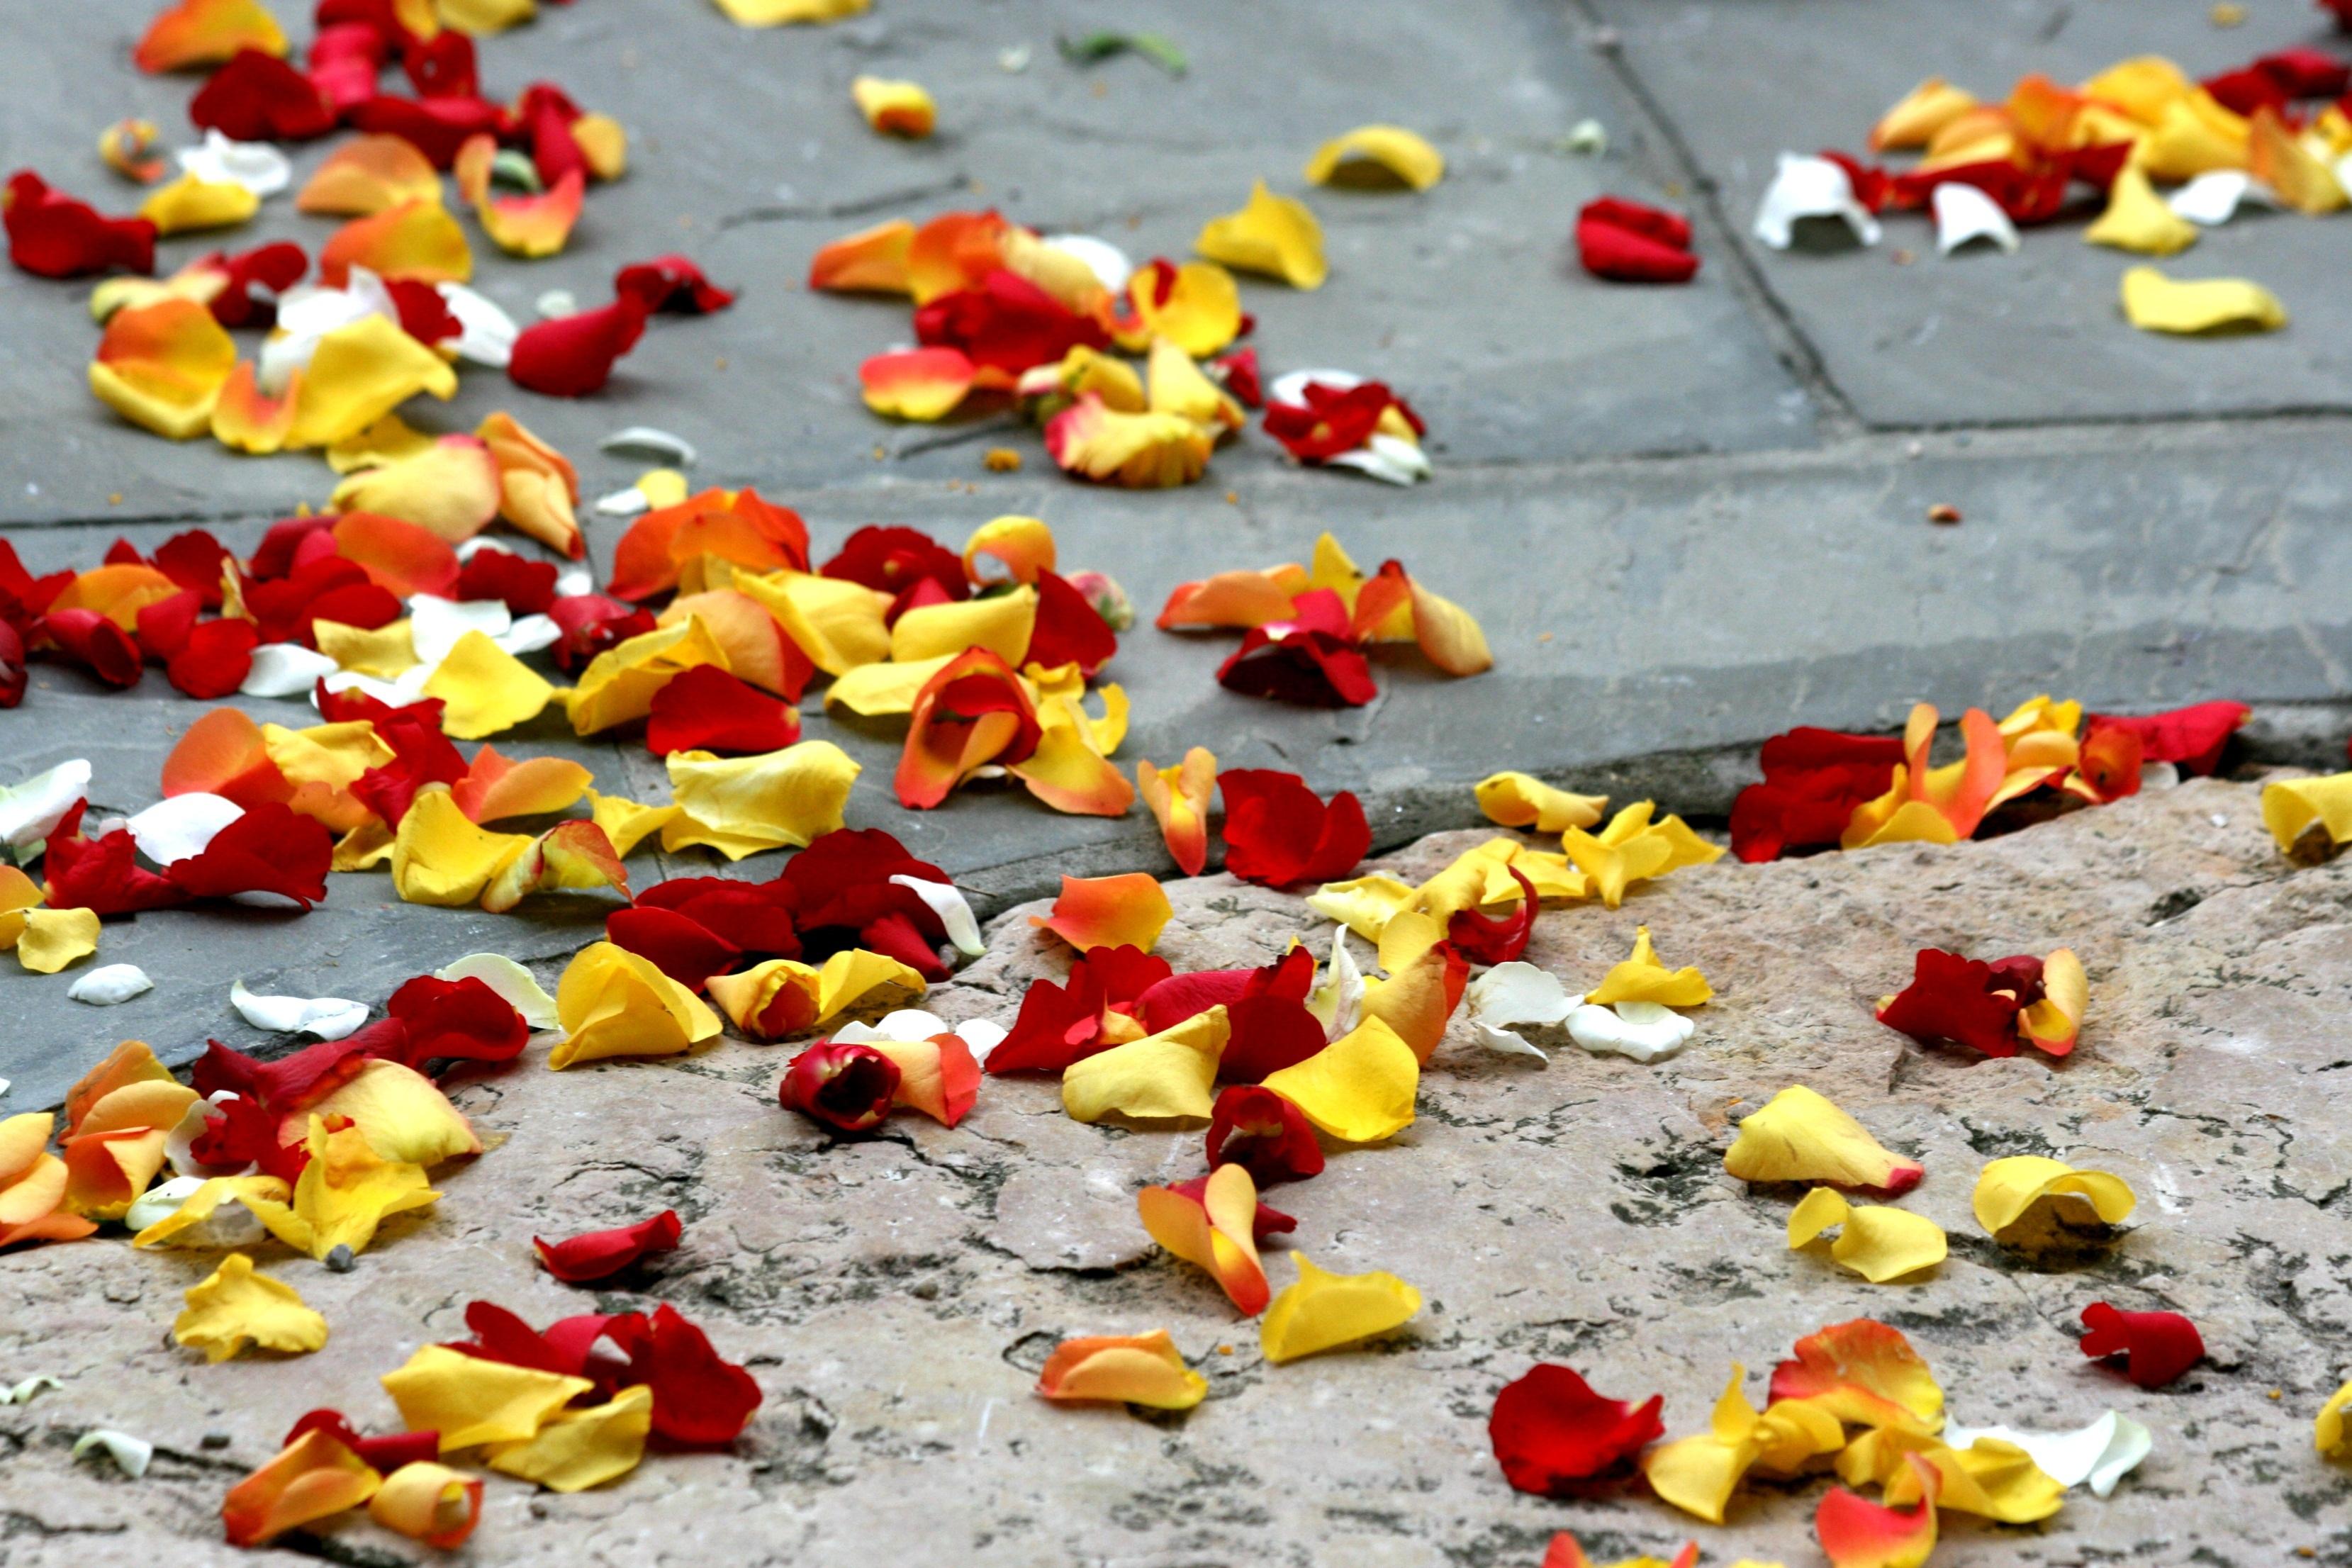 Kostenlose foto : blühen, Pflanze, Blatt, Blume, Blütenblatt, Blumen ...